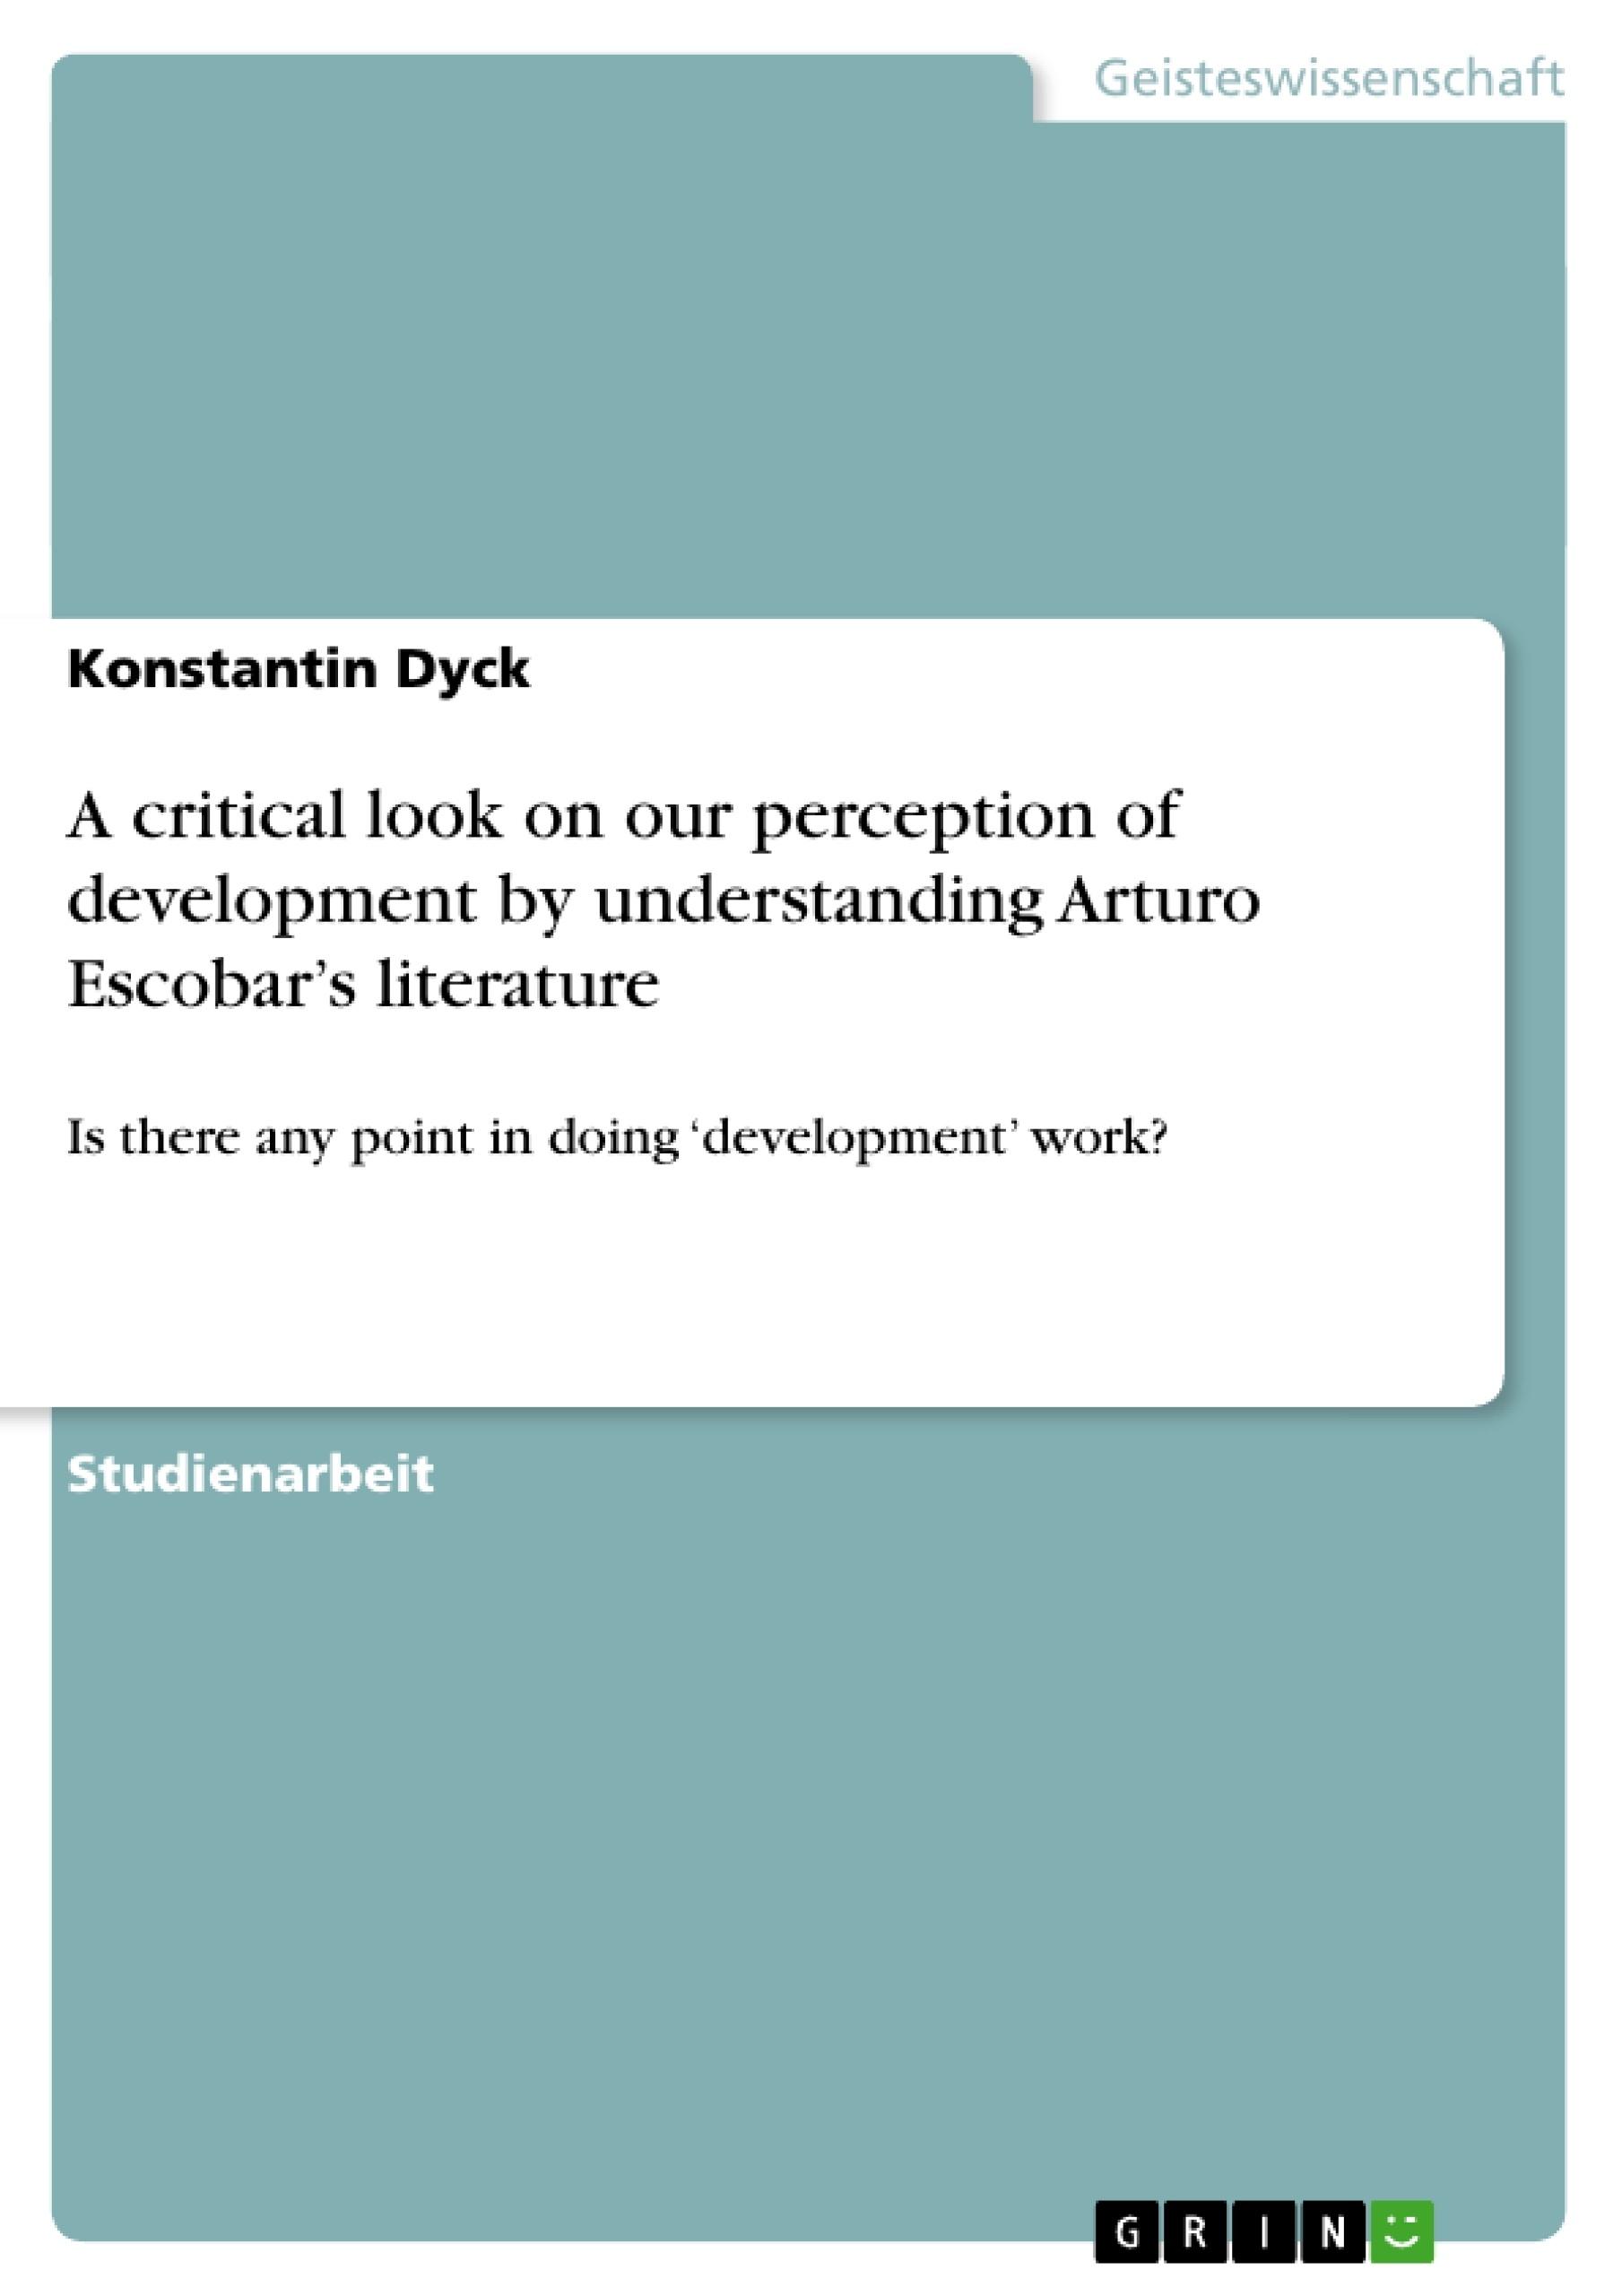 Titel: A critical look on our perception of development by understanding Arturo Escobar's literature